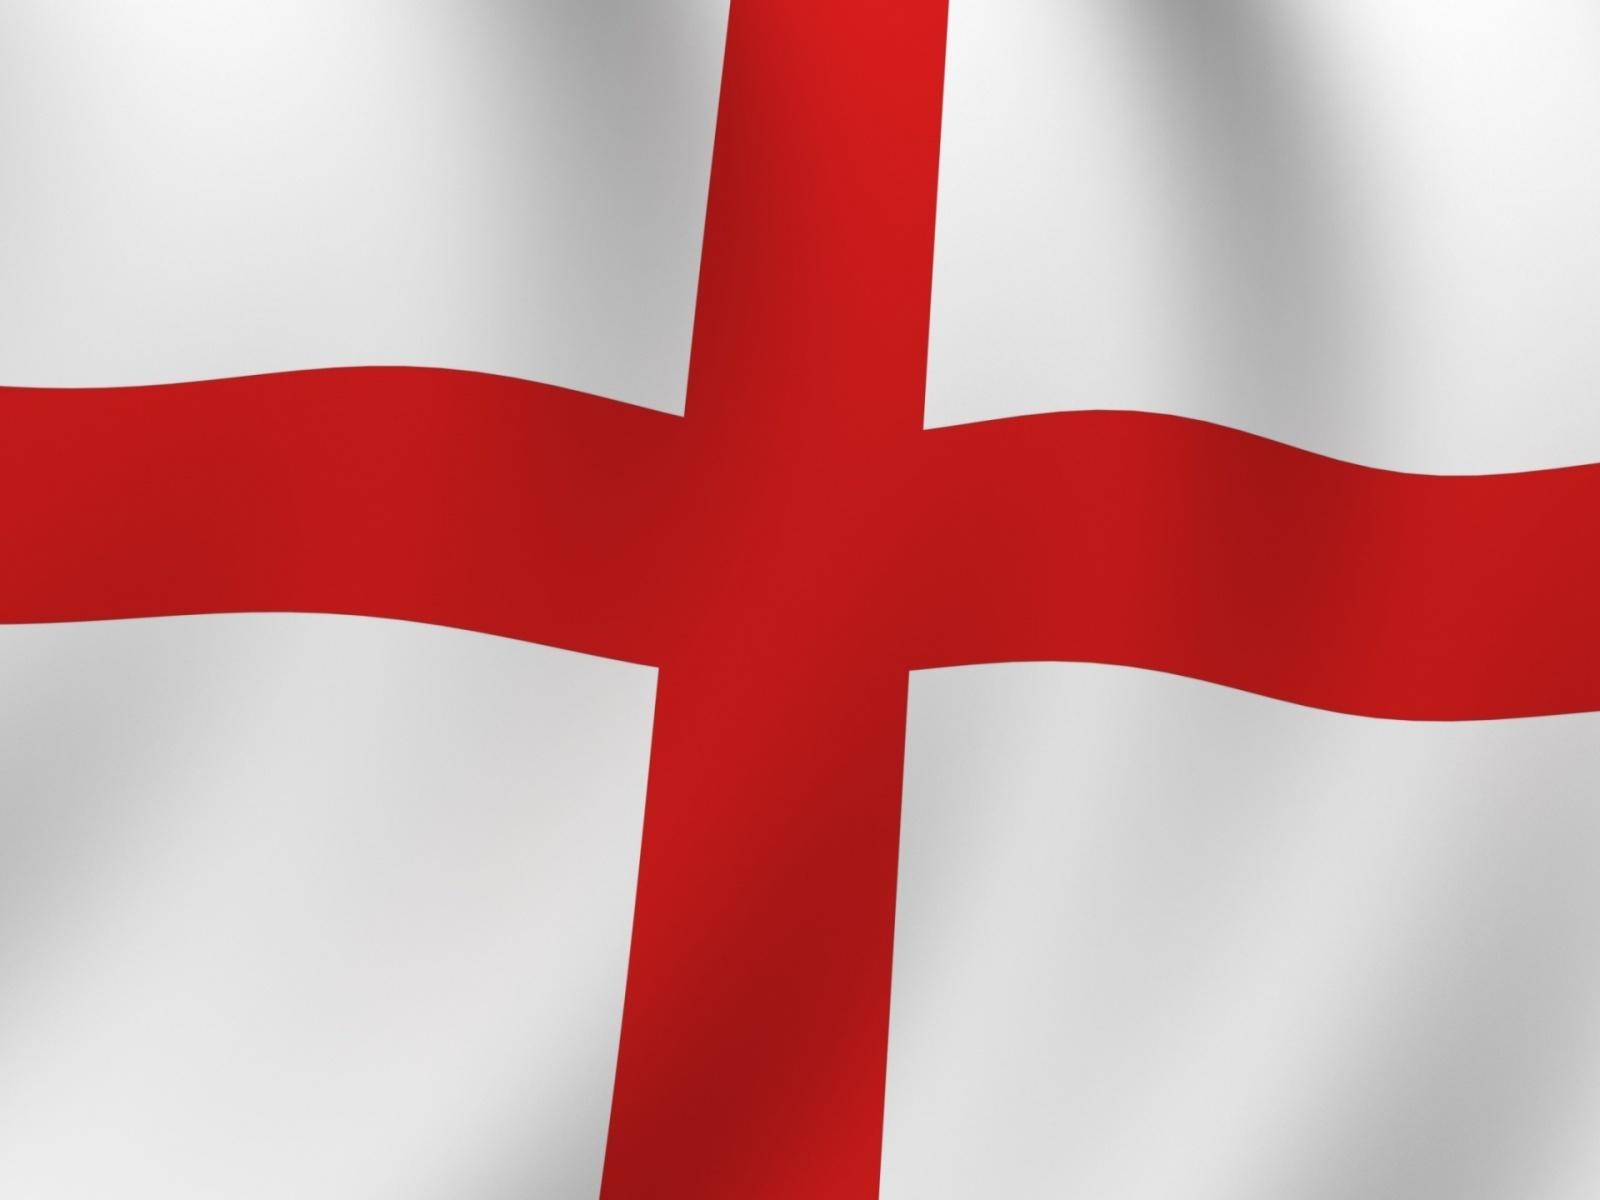 England flag wallpaper in 1600x1200 screen resolution 1600x1200